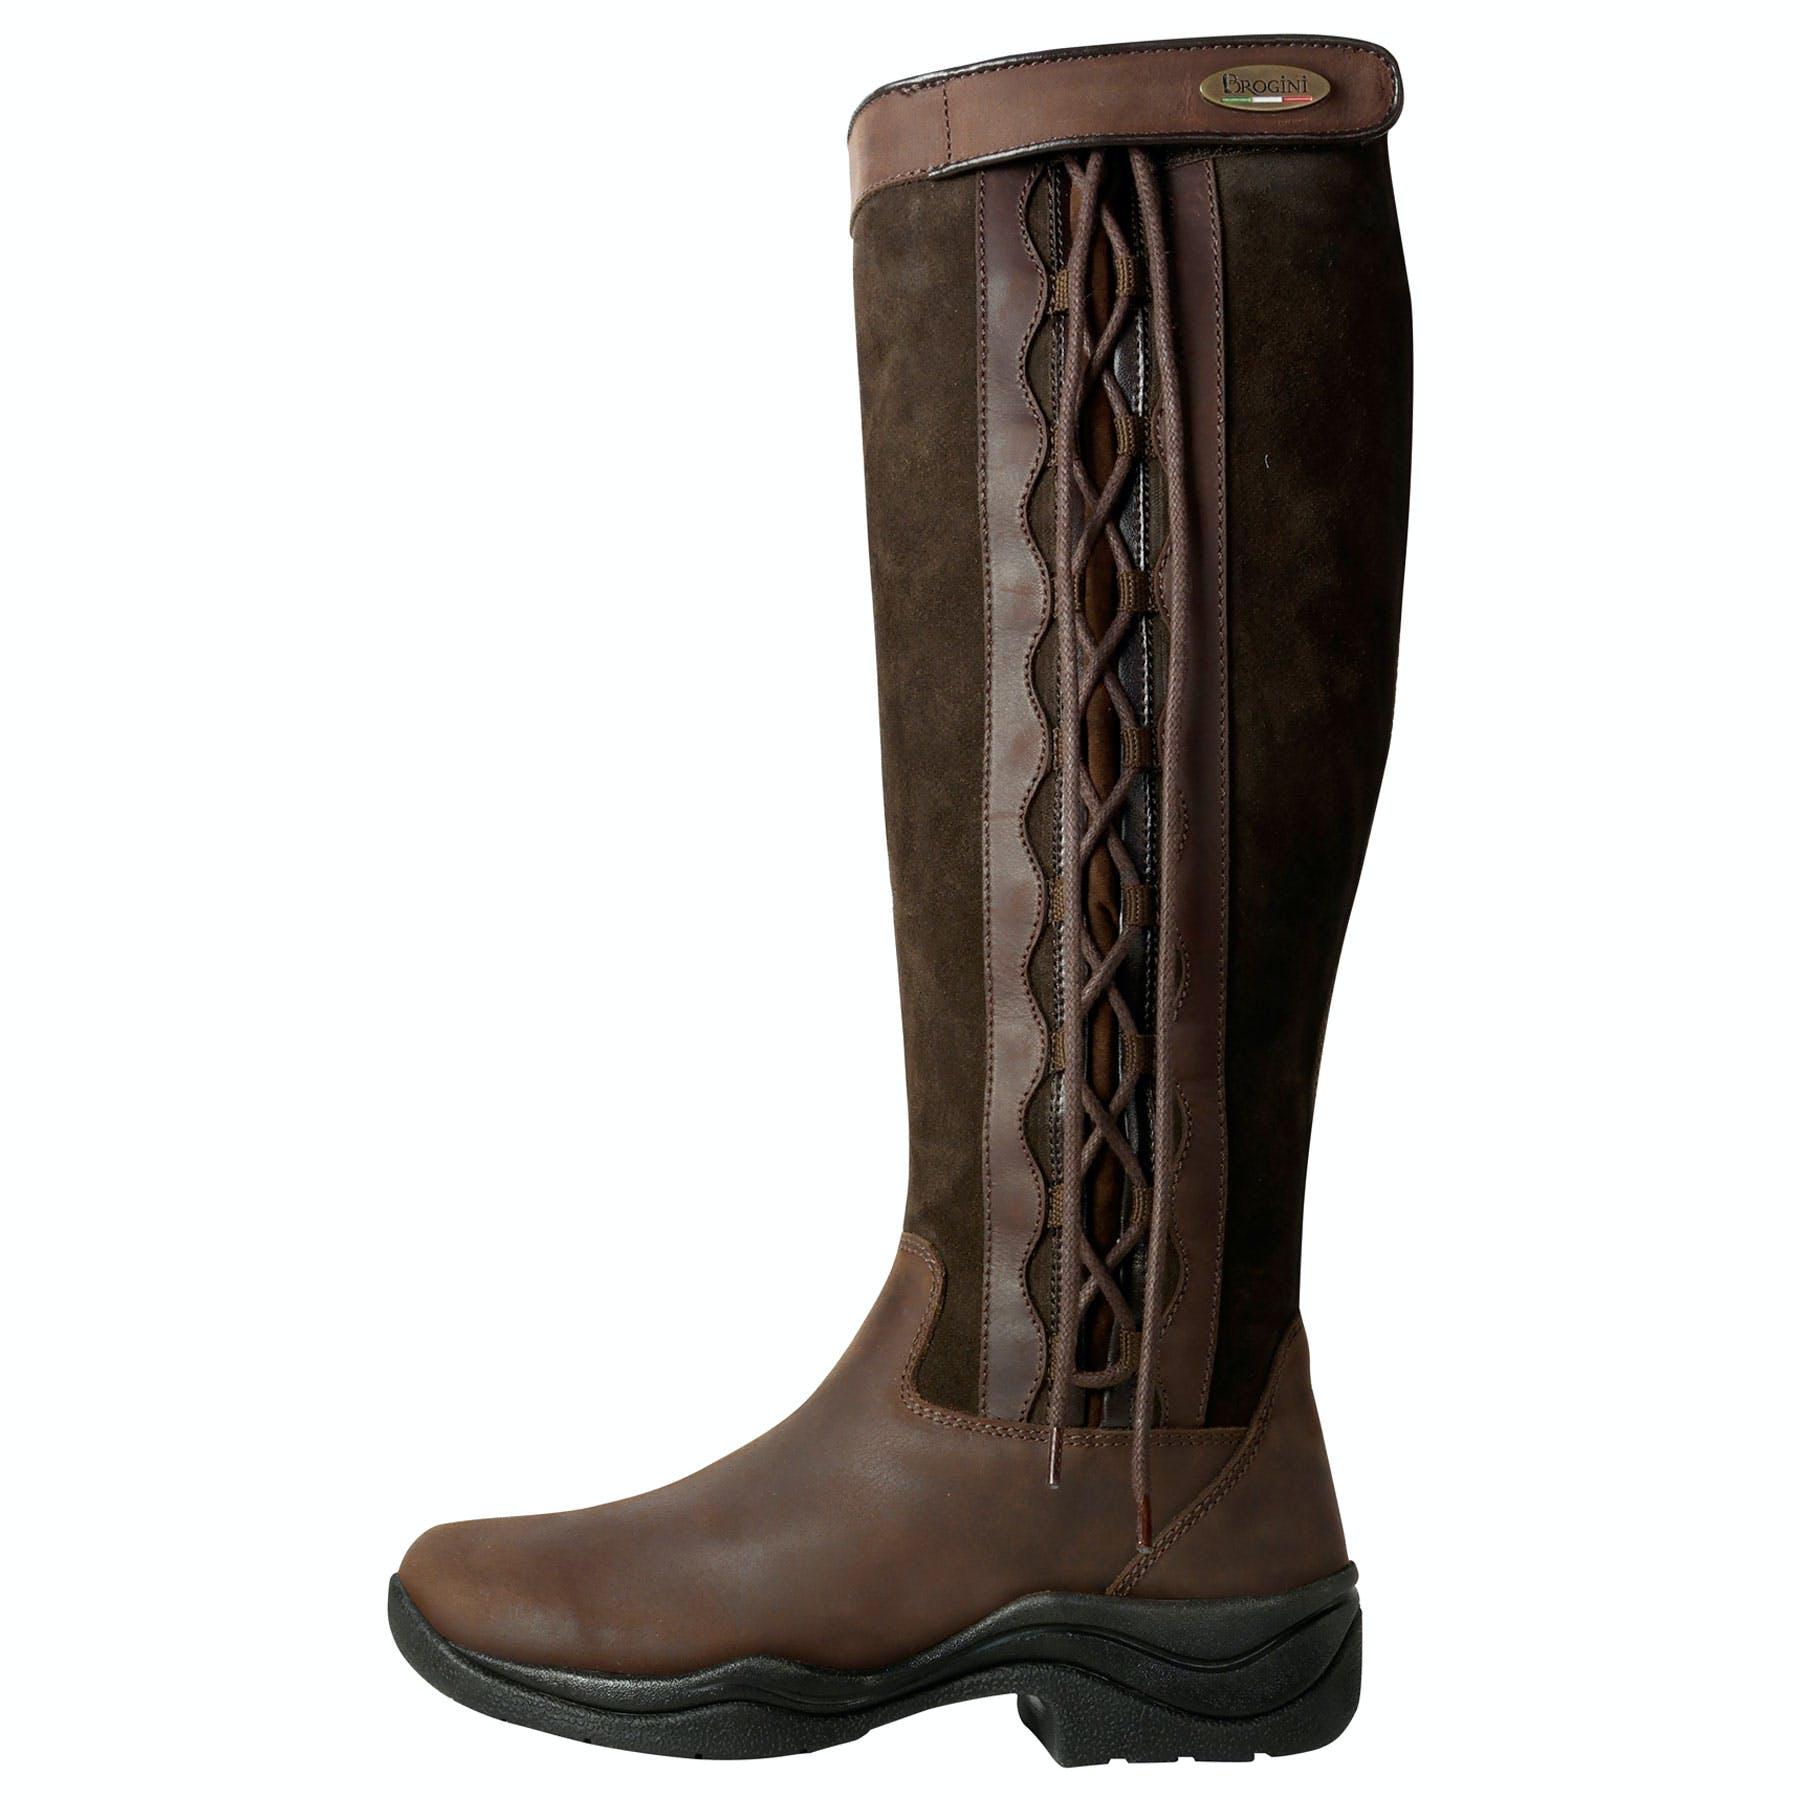 Brogini New Capitoli Tall Long Riding Boots